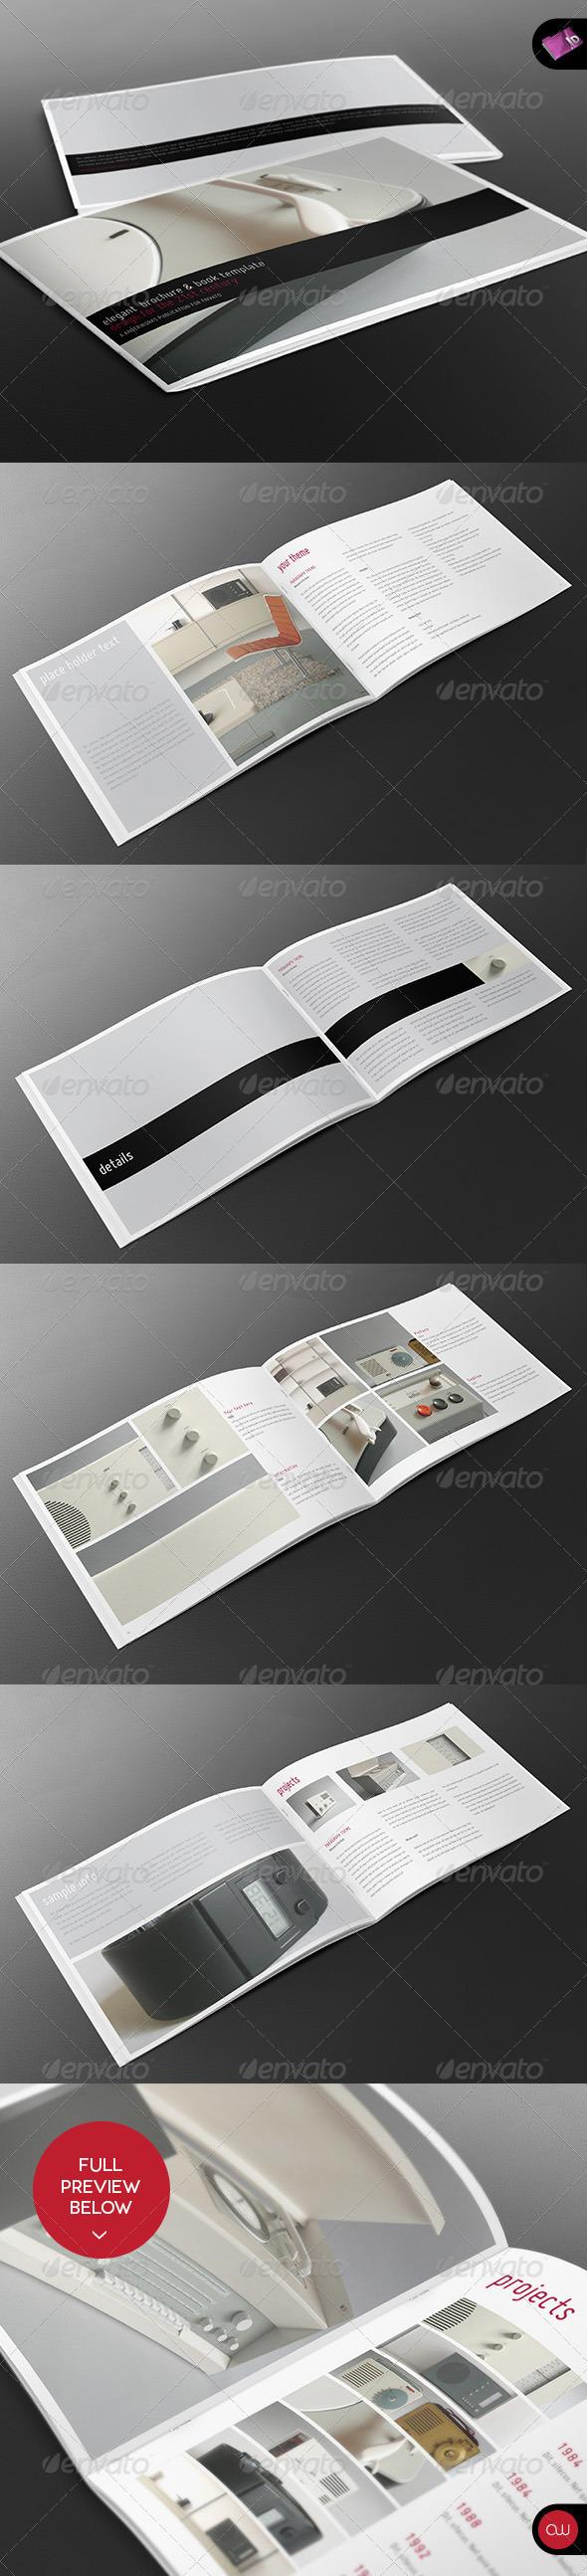 GraphicRiver Book & Brochure Elegant Series Vol.2 2625582